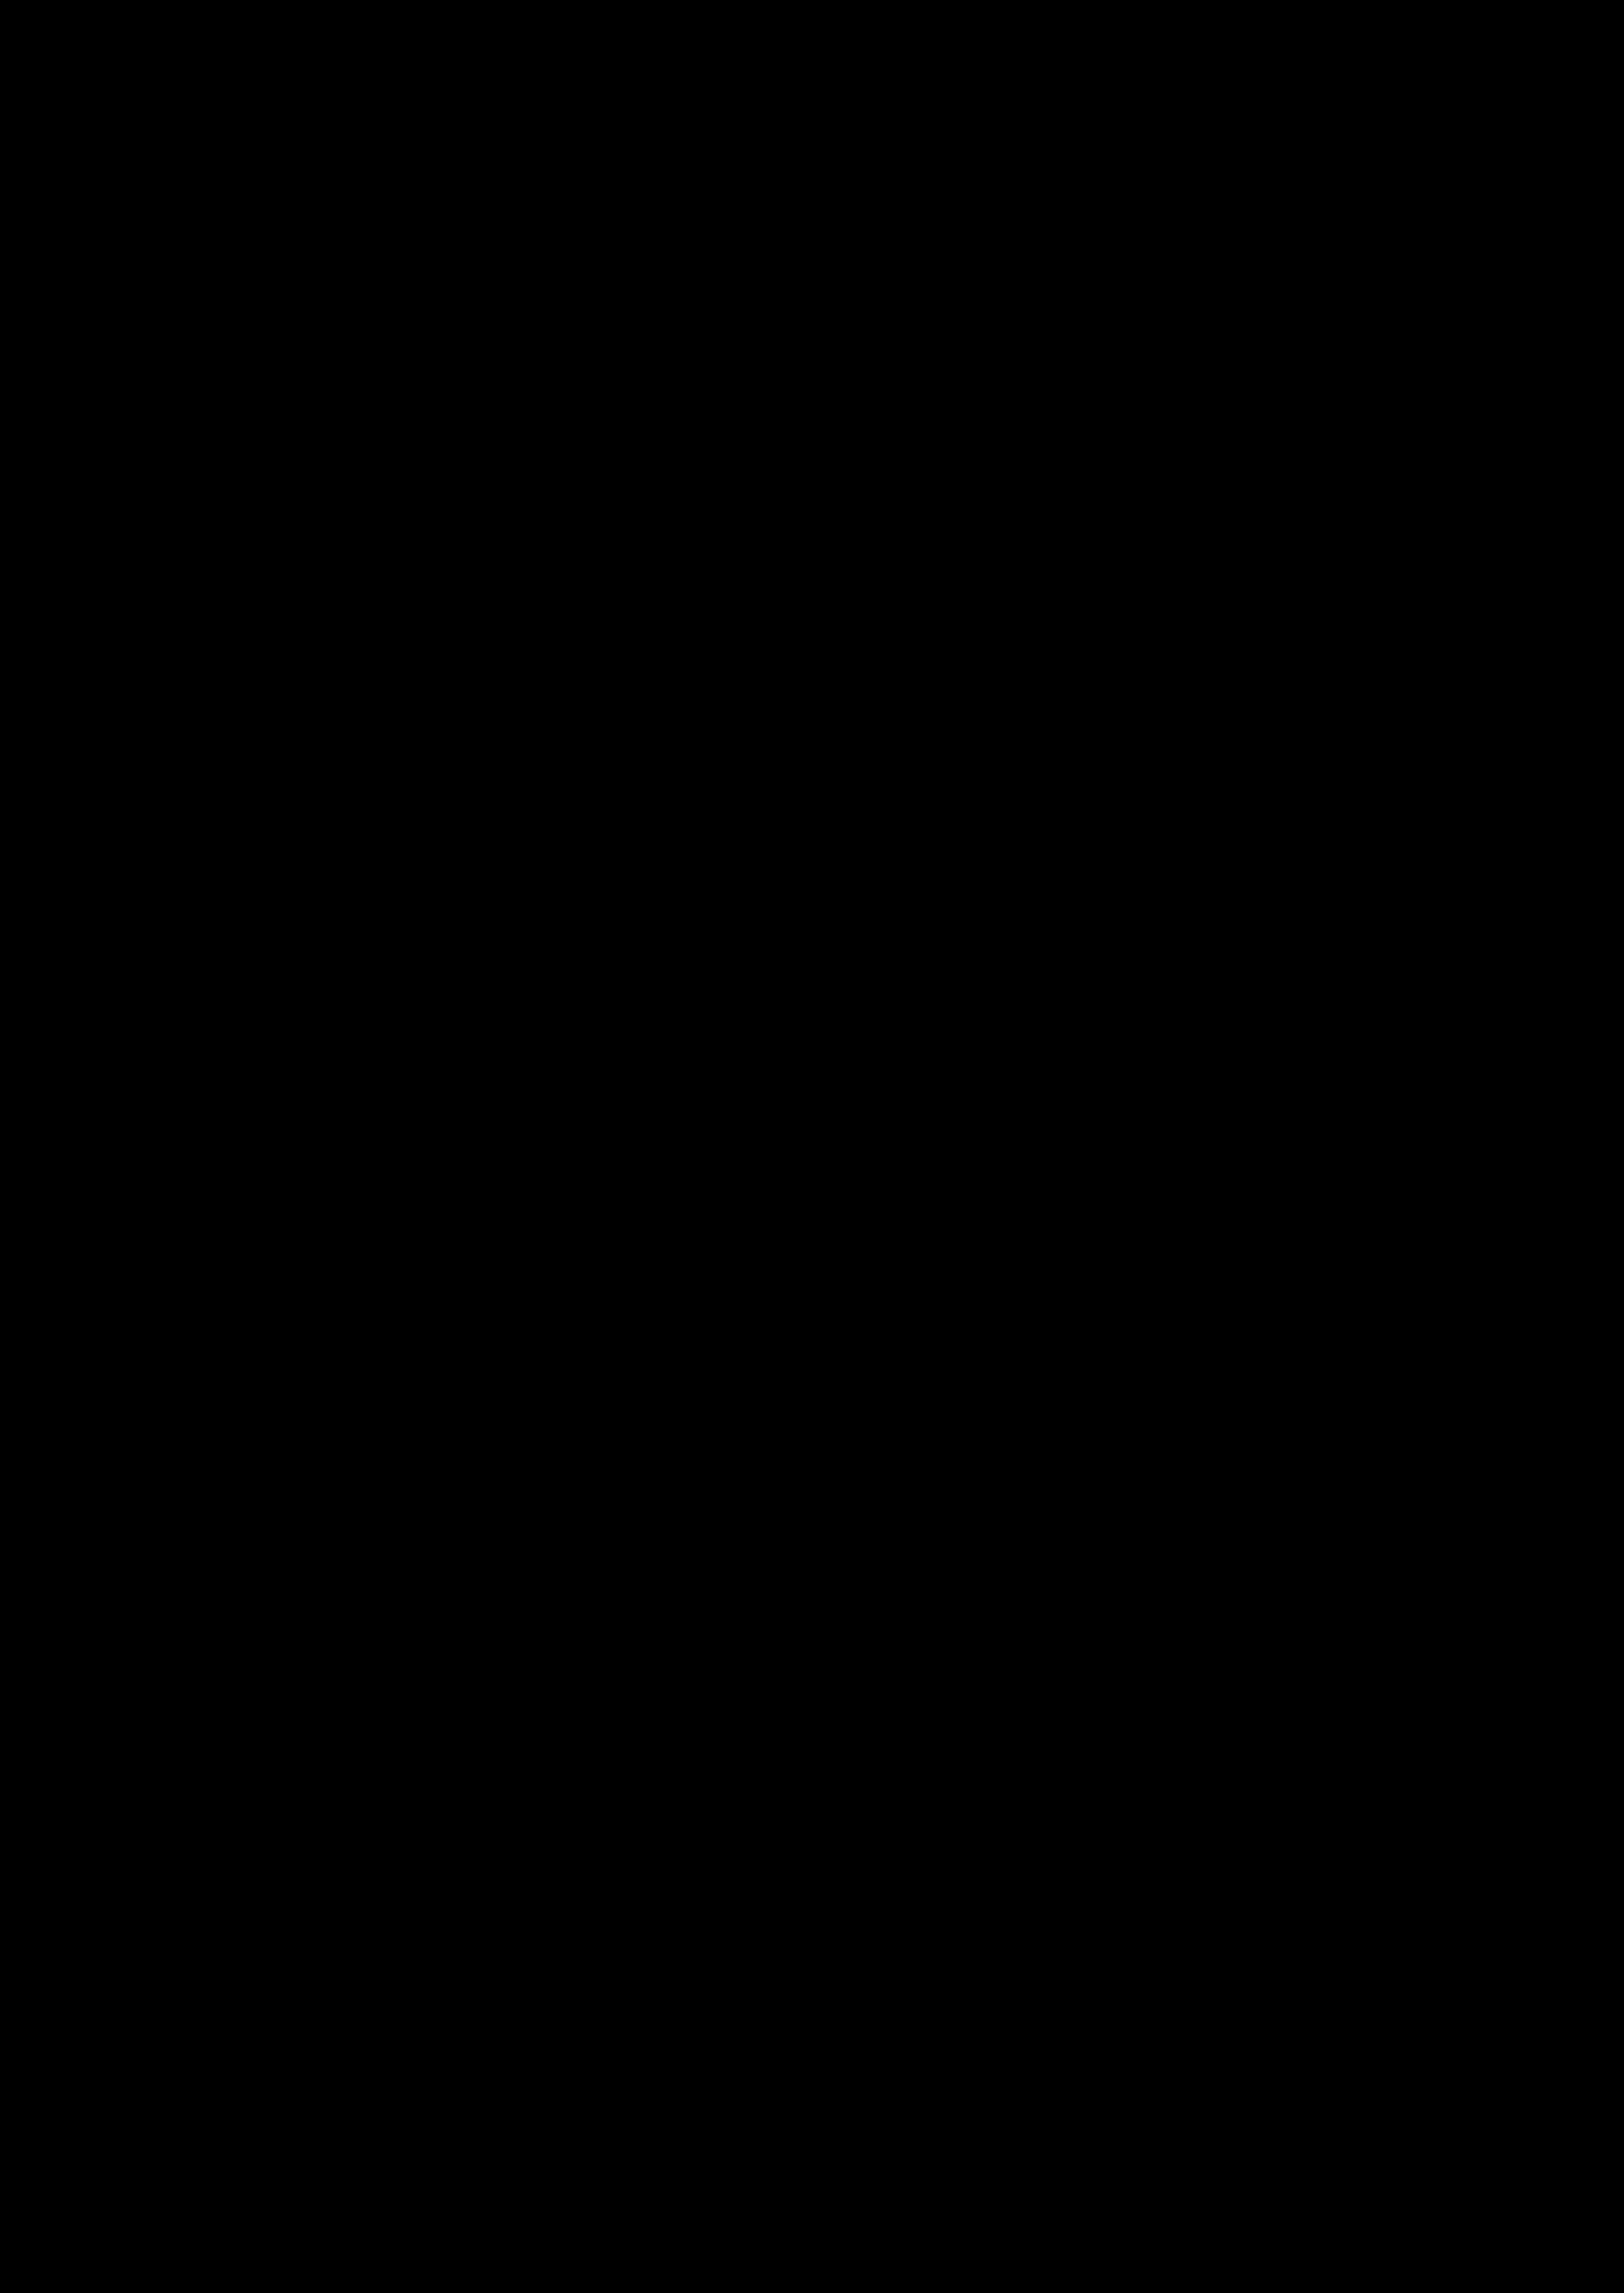 letter-s14